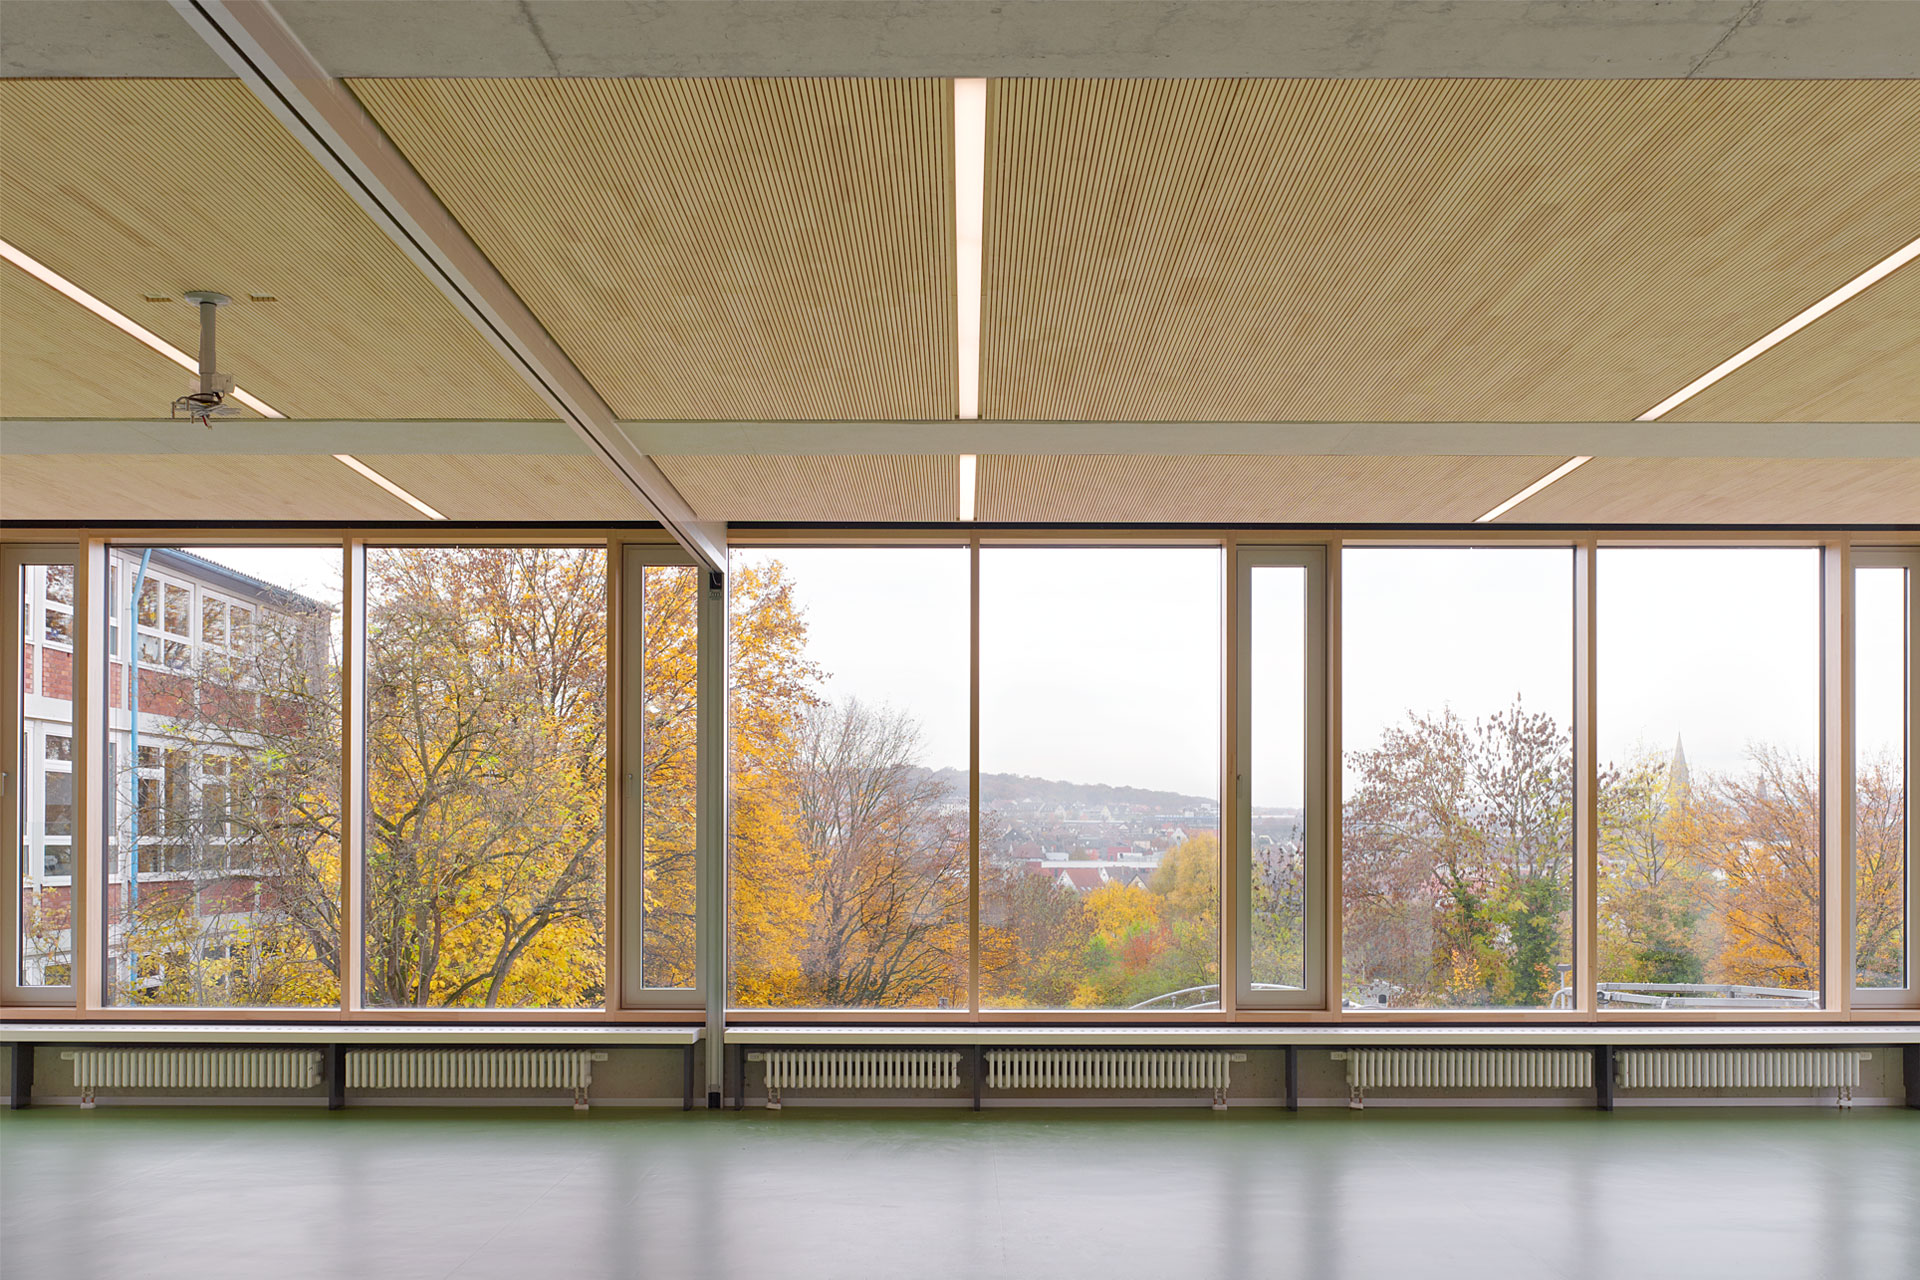 Architekt, Schülermensa, Holzakustikdecke, Linoleum